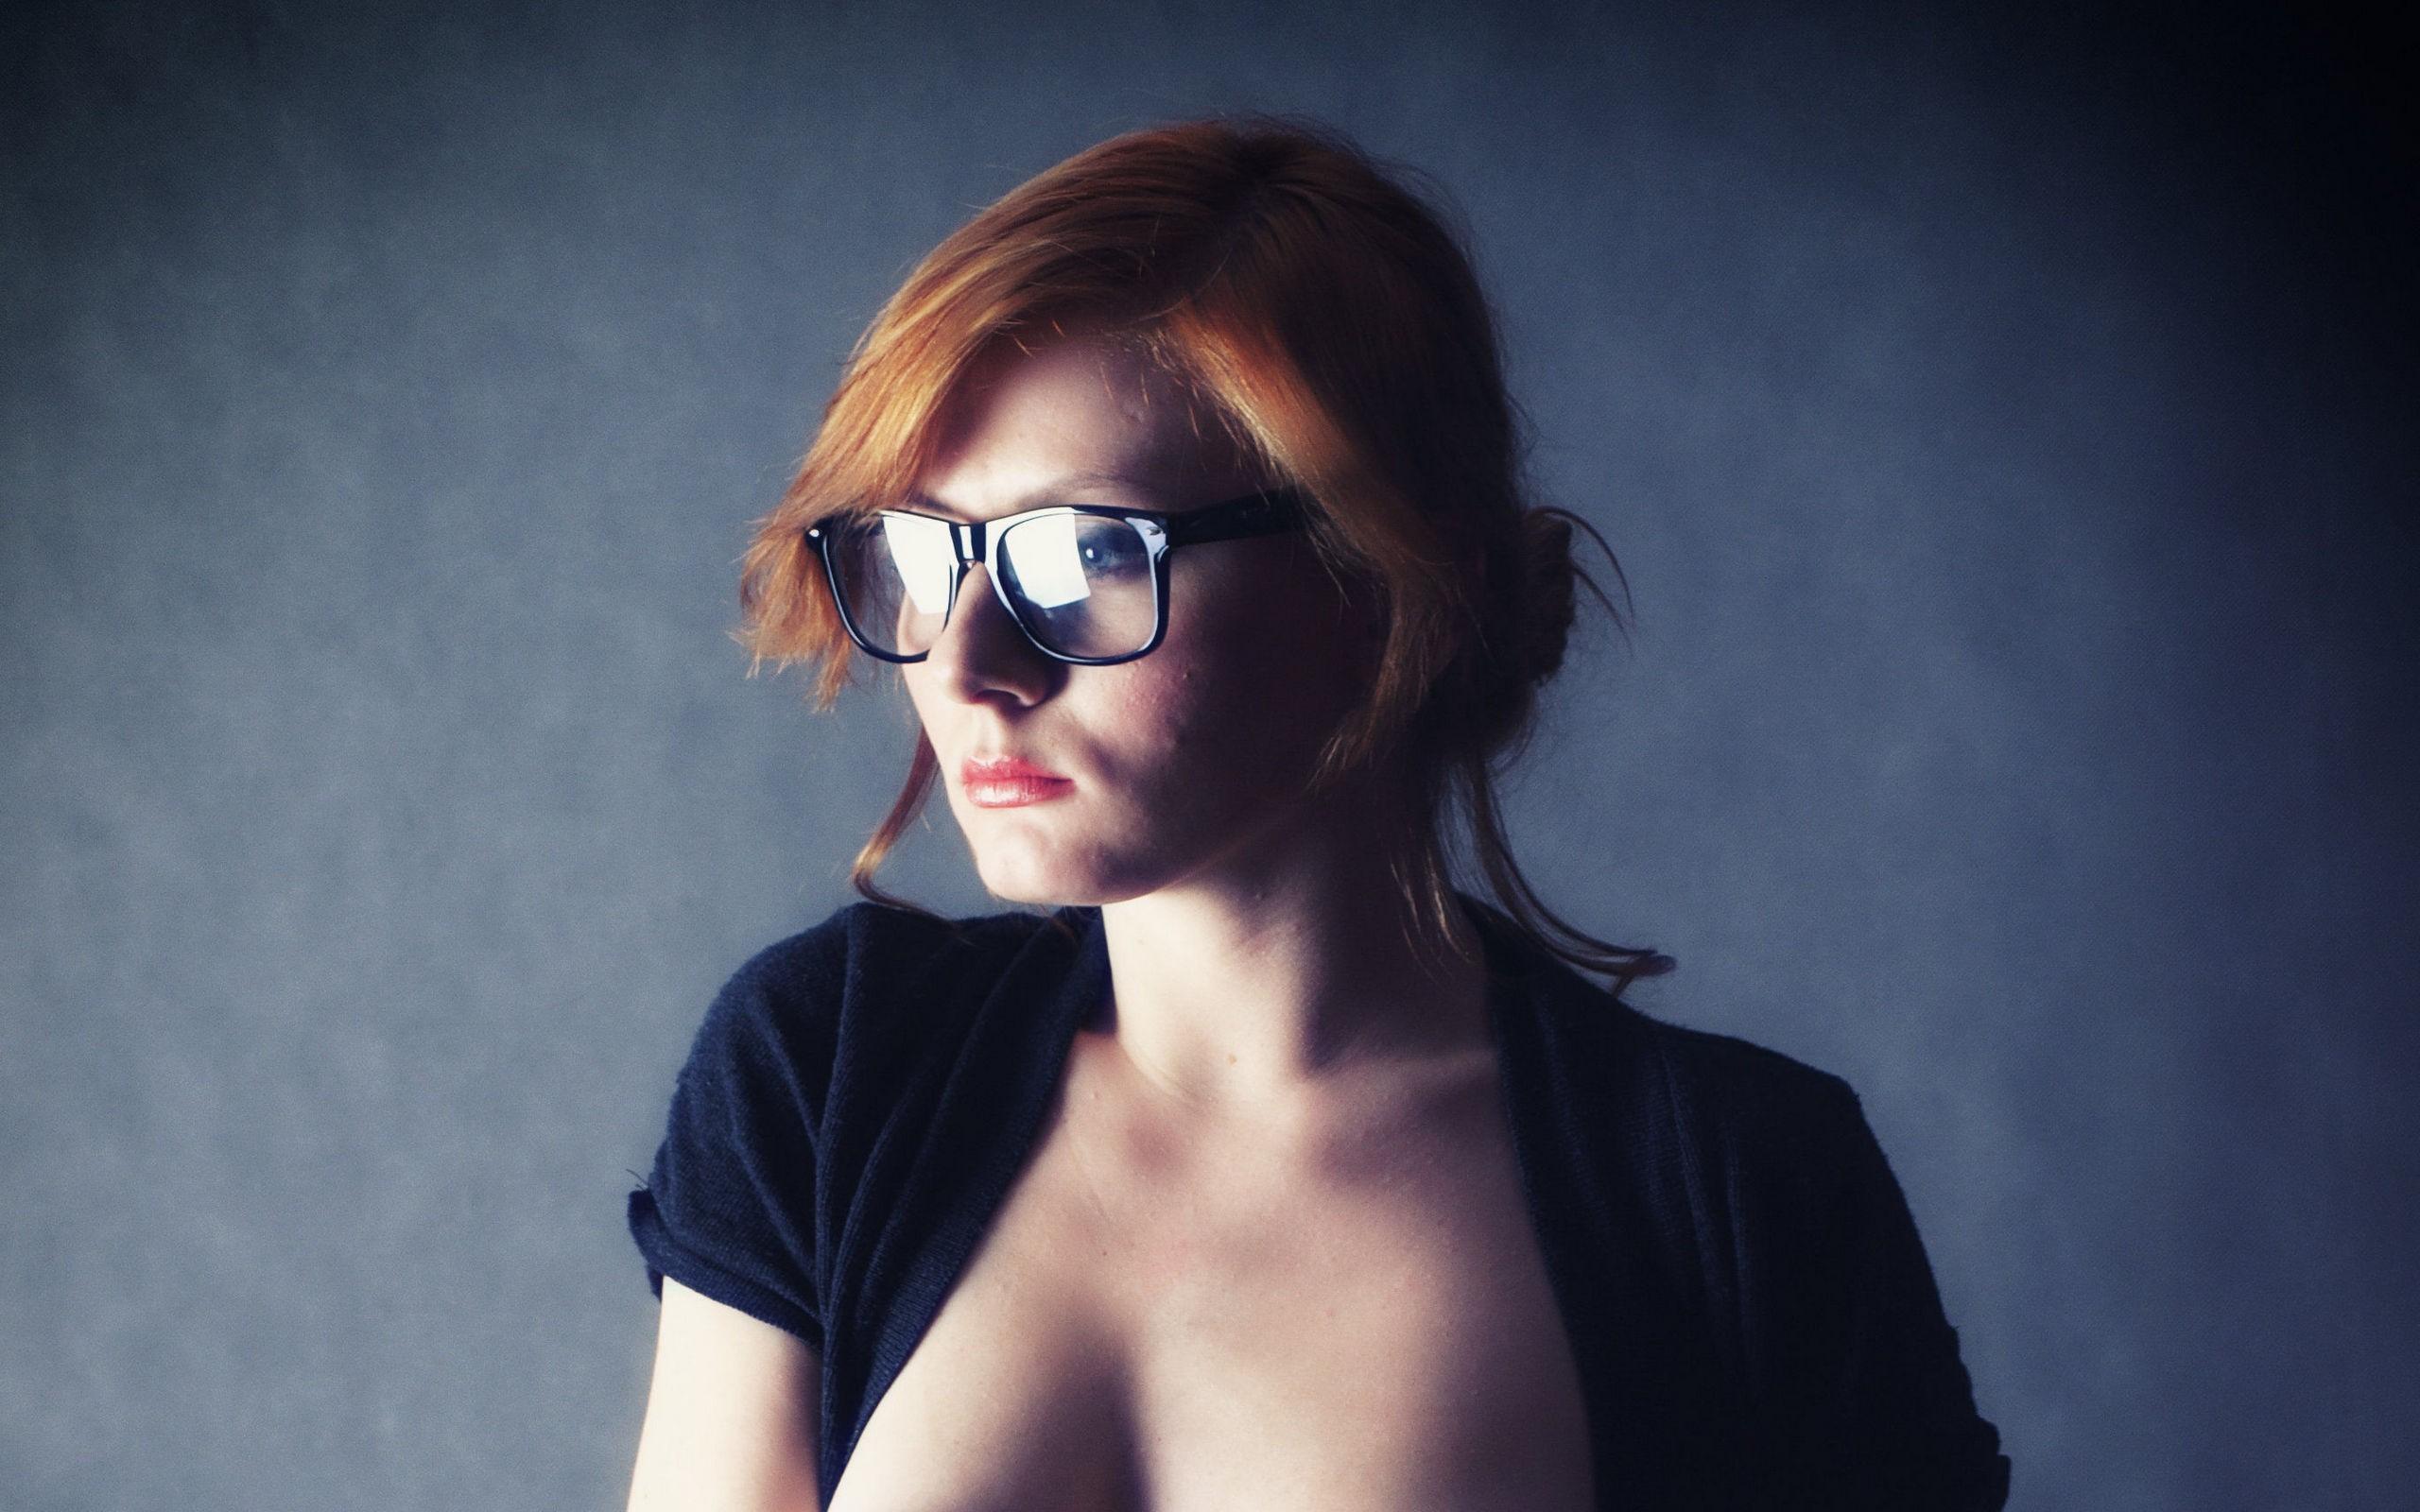 Wallpaper Wanita Si Rambut Merah Model Kacamata Hitam Biru Mode Payudara Keren Gadis Keindahan Mata Hairstyle Fotografi Potret Pemotretan Perawatan Penglihatan Organ 2560x1600 Wallpapermaniac 342357 Hd Wallpapers Wallhere